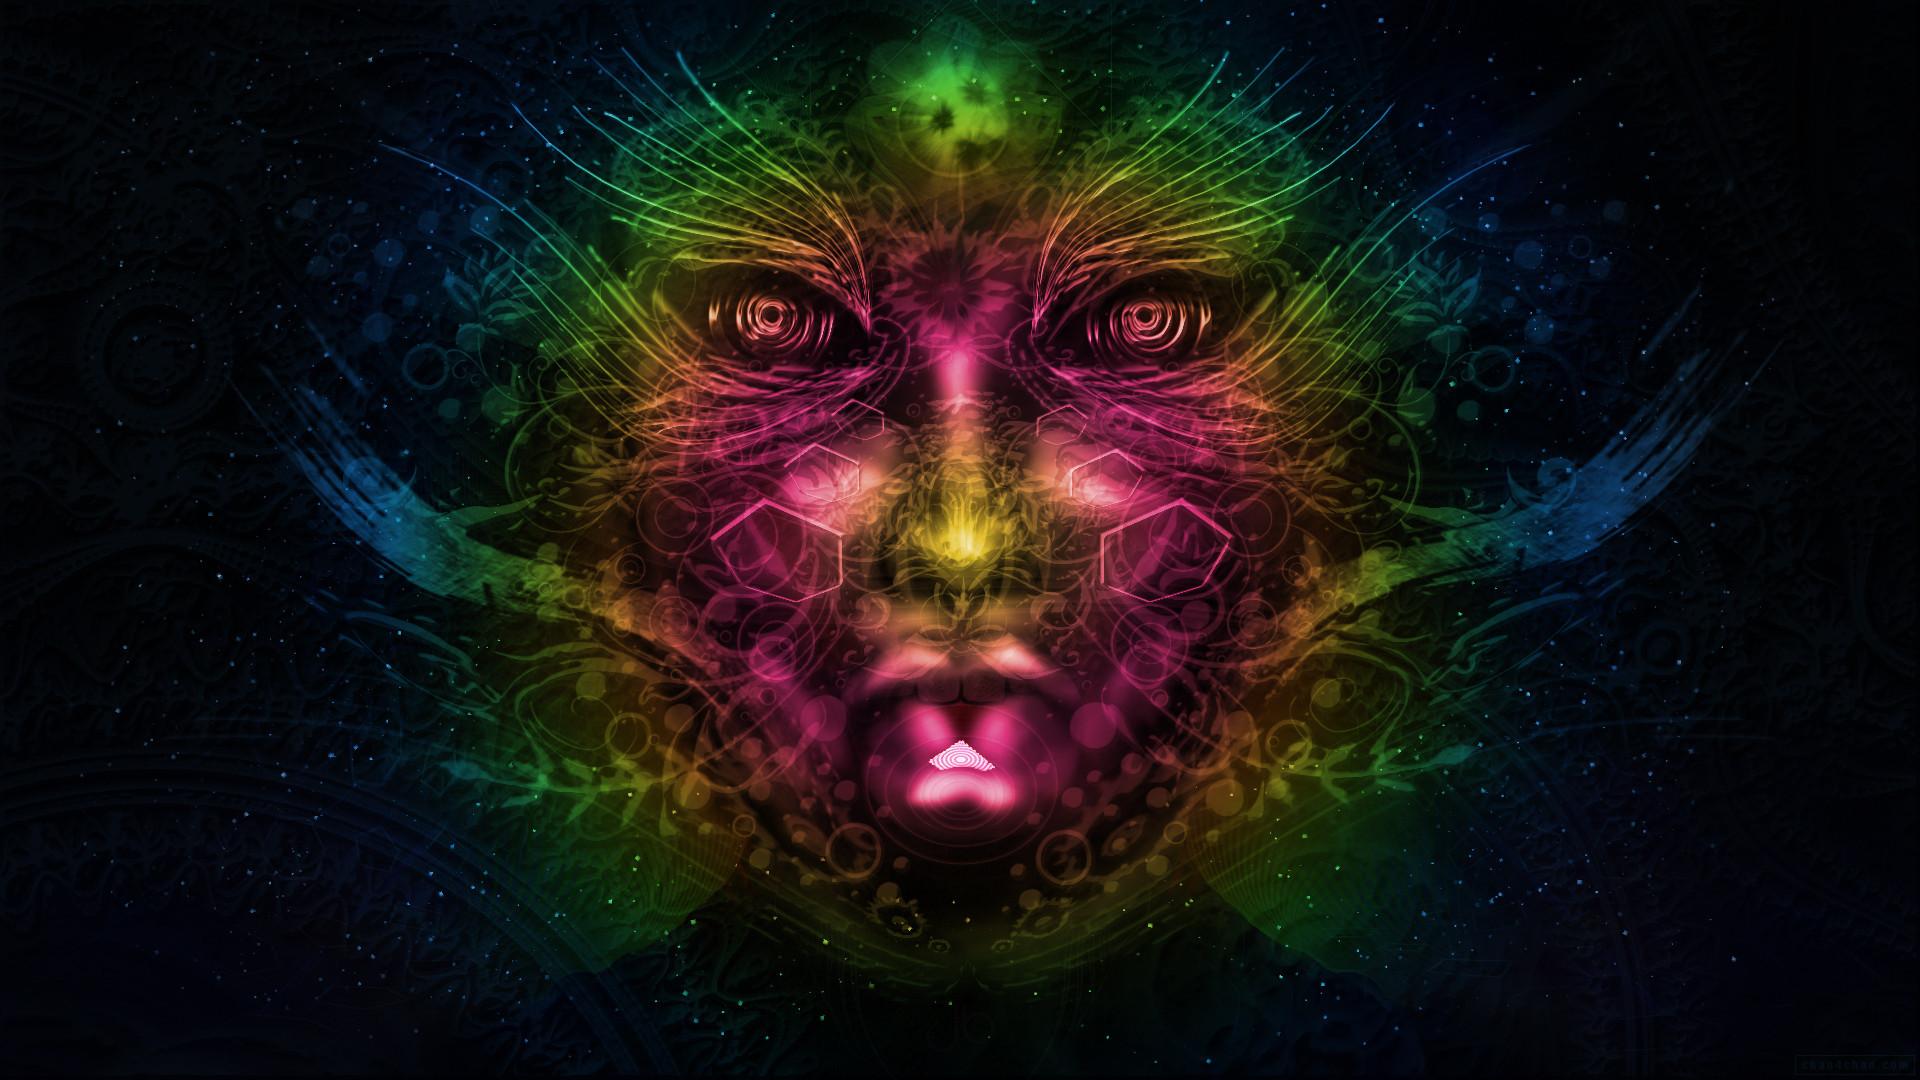 Acid Trip Wallpapers (71+ images)